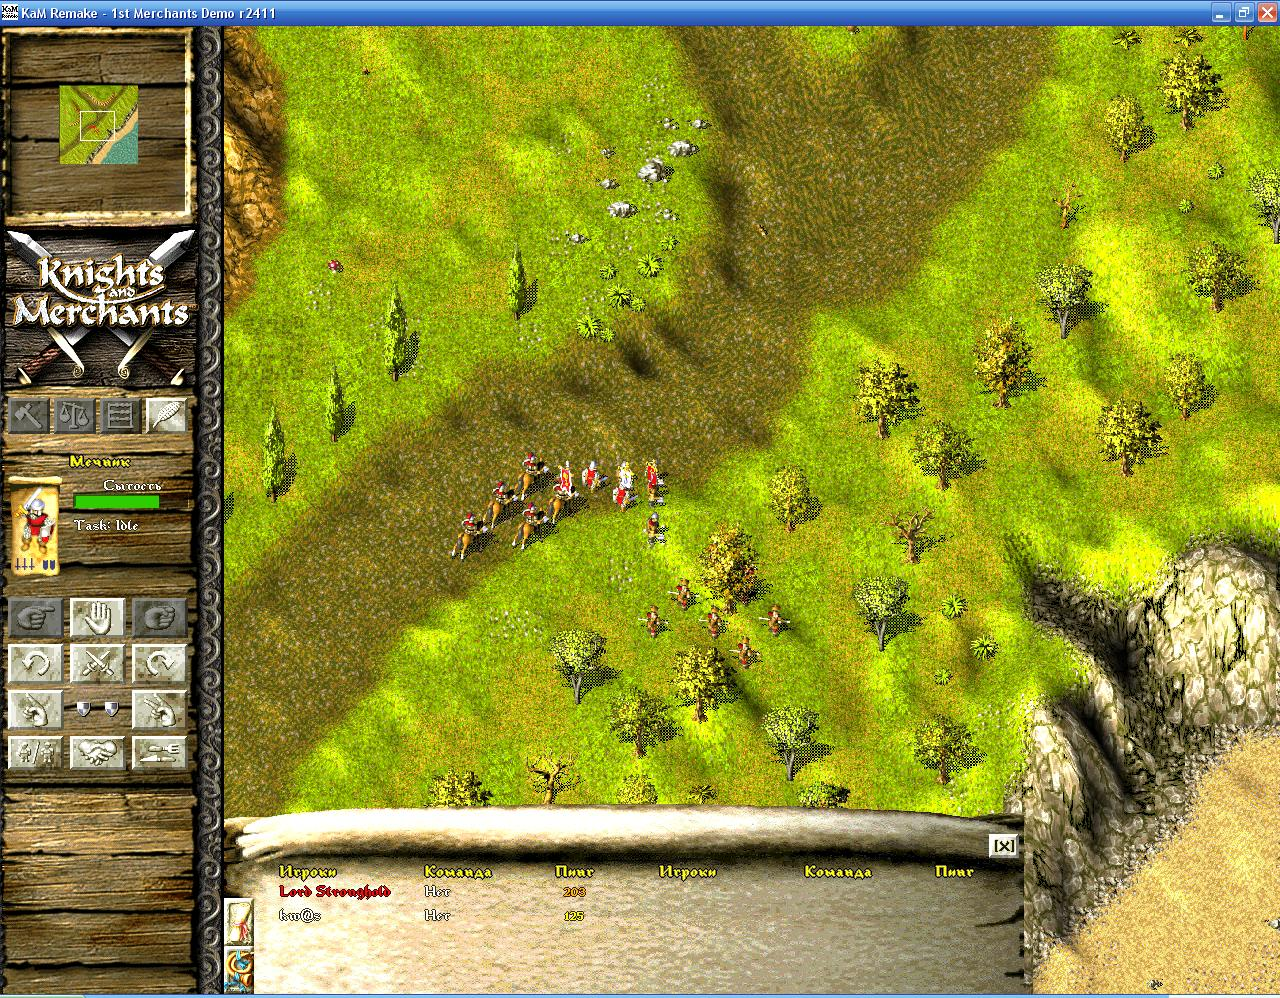 kw@s.JPG - Knights & Merchants: The Peasants Rebellion